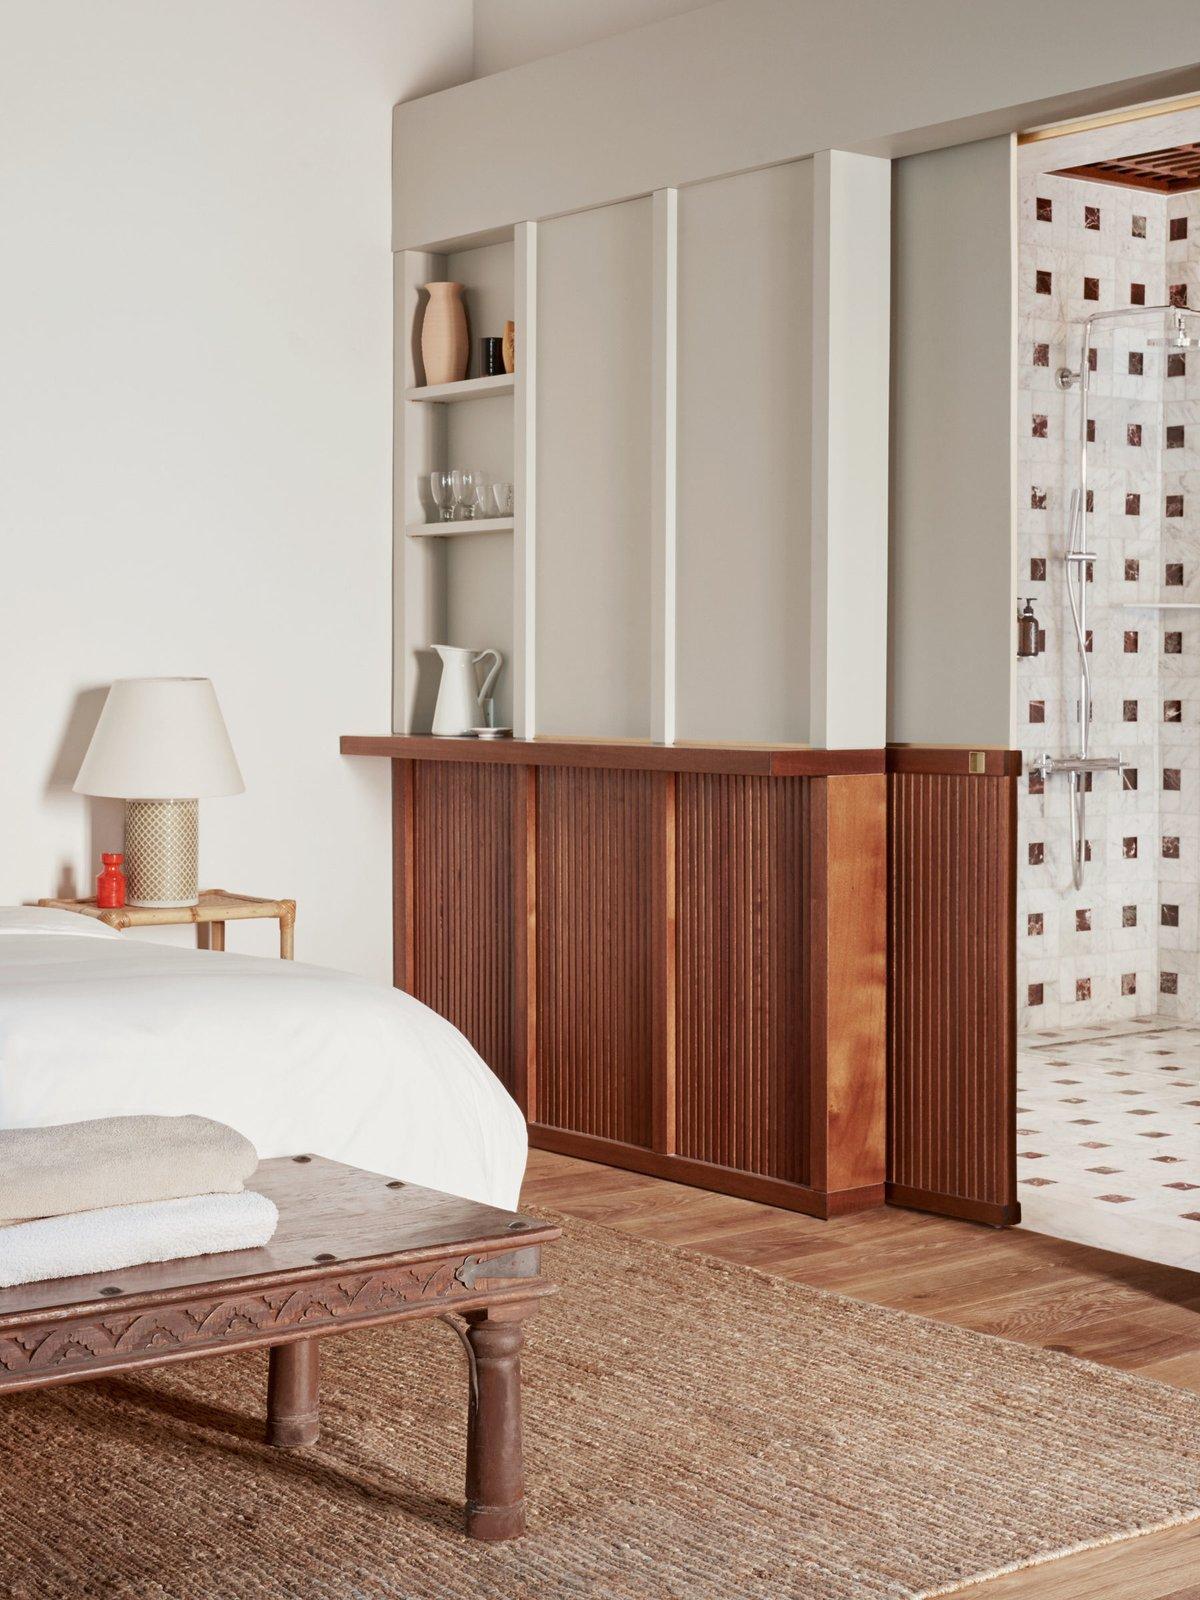 Villa Lena Fattoria Hesselbrand bedroom